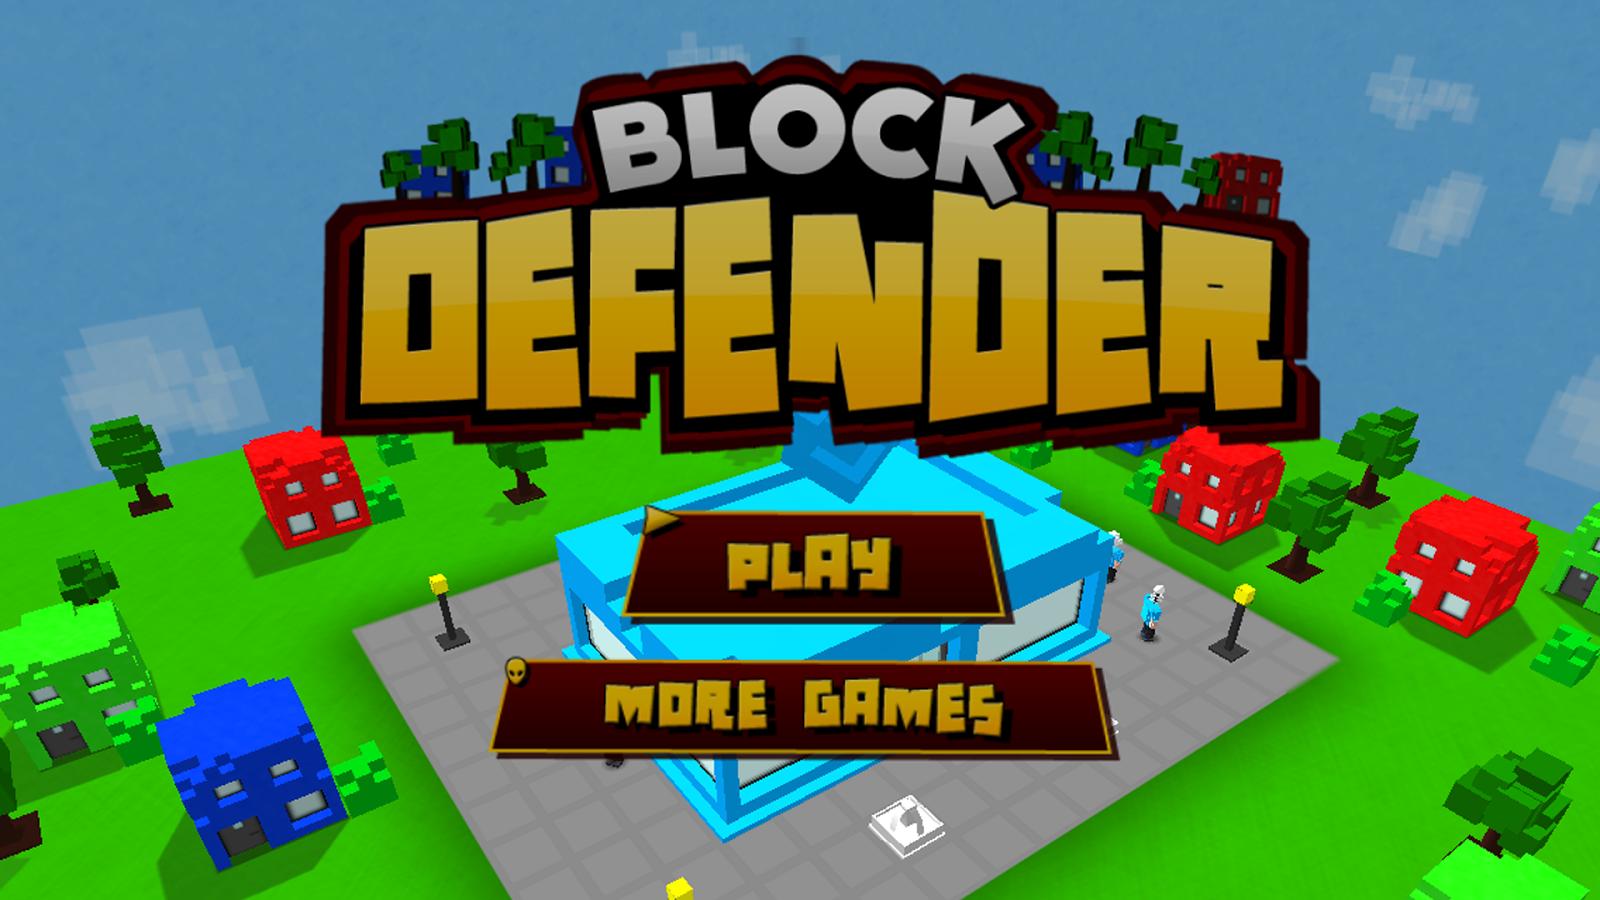 Tower defense 5 officialannakendrick com click for details btd 5